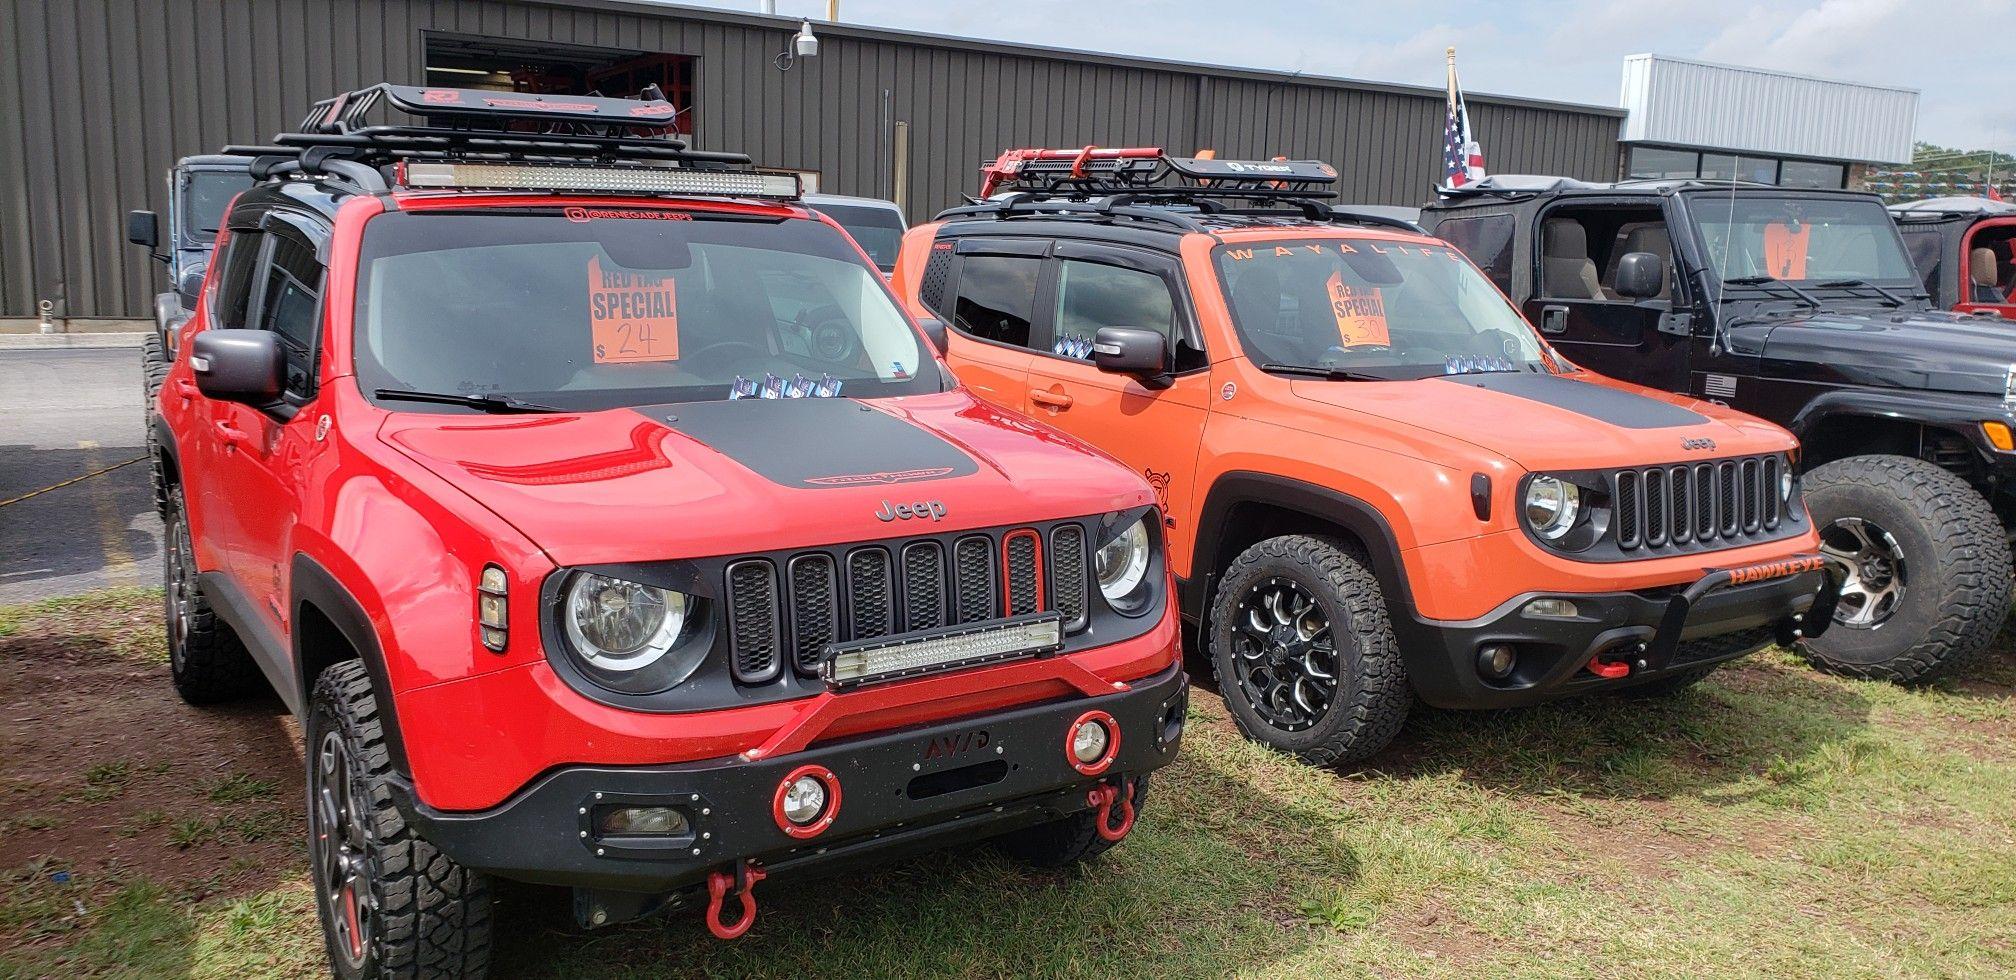 Havek And Hawkeye Jeep Renegade Jeep Renegade Trailhawk Custom